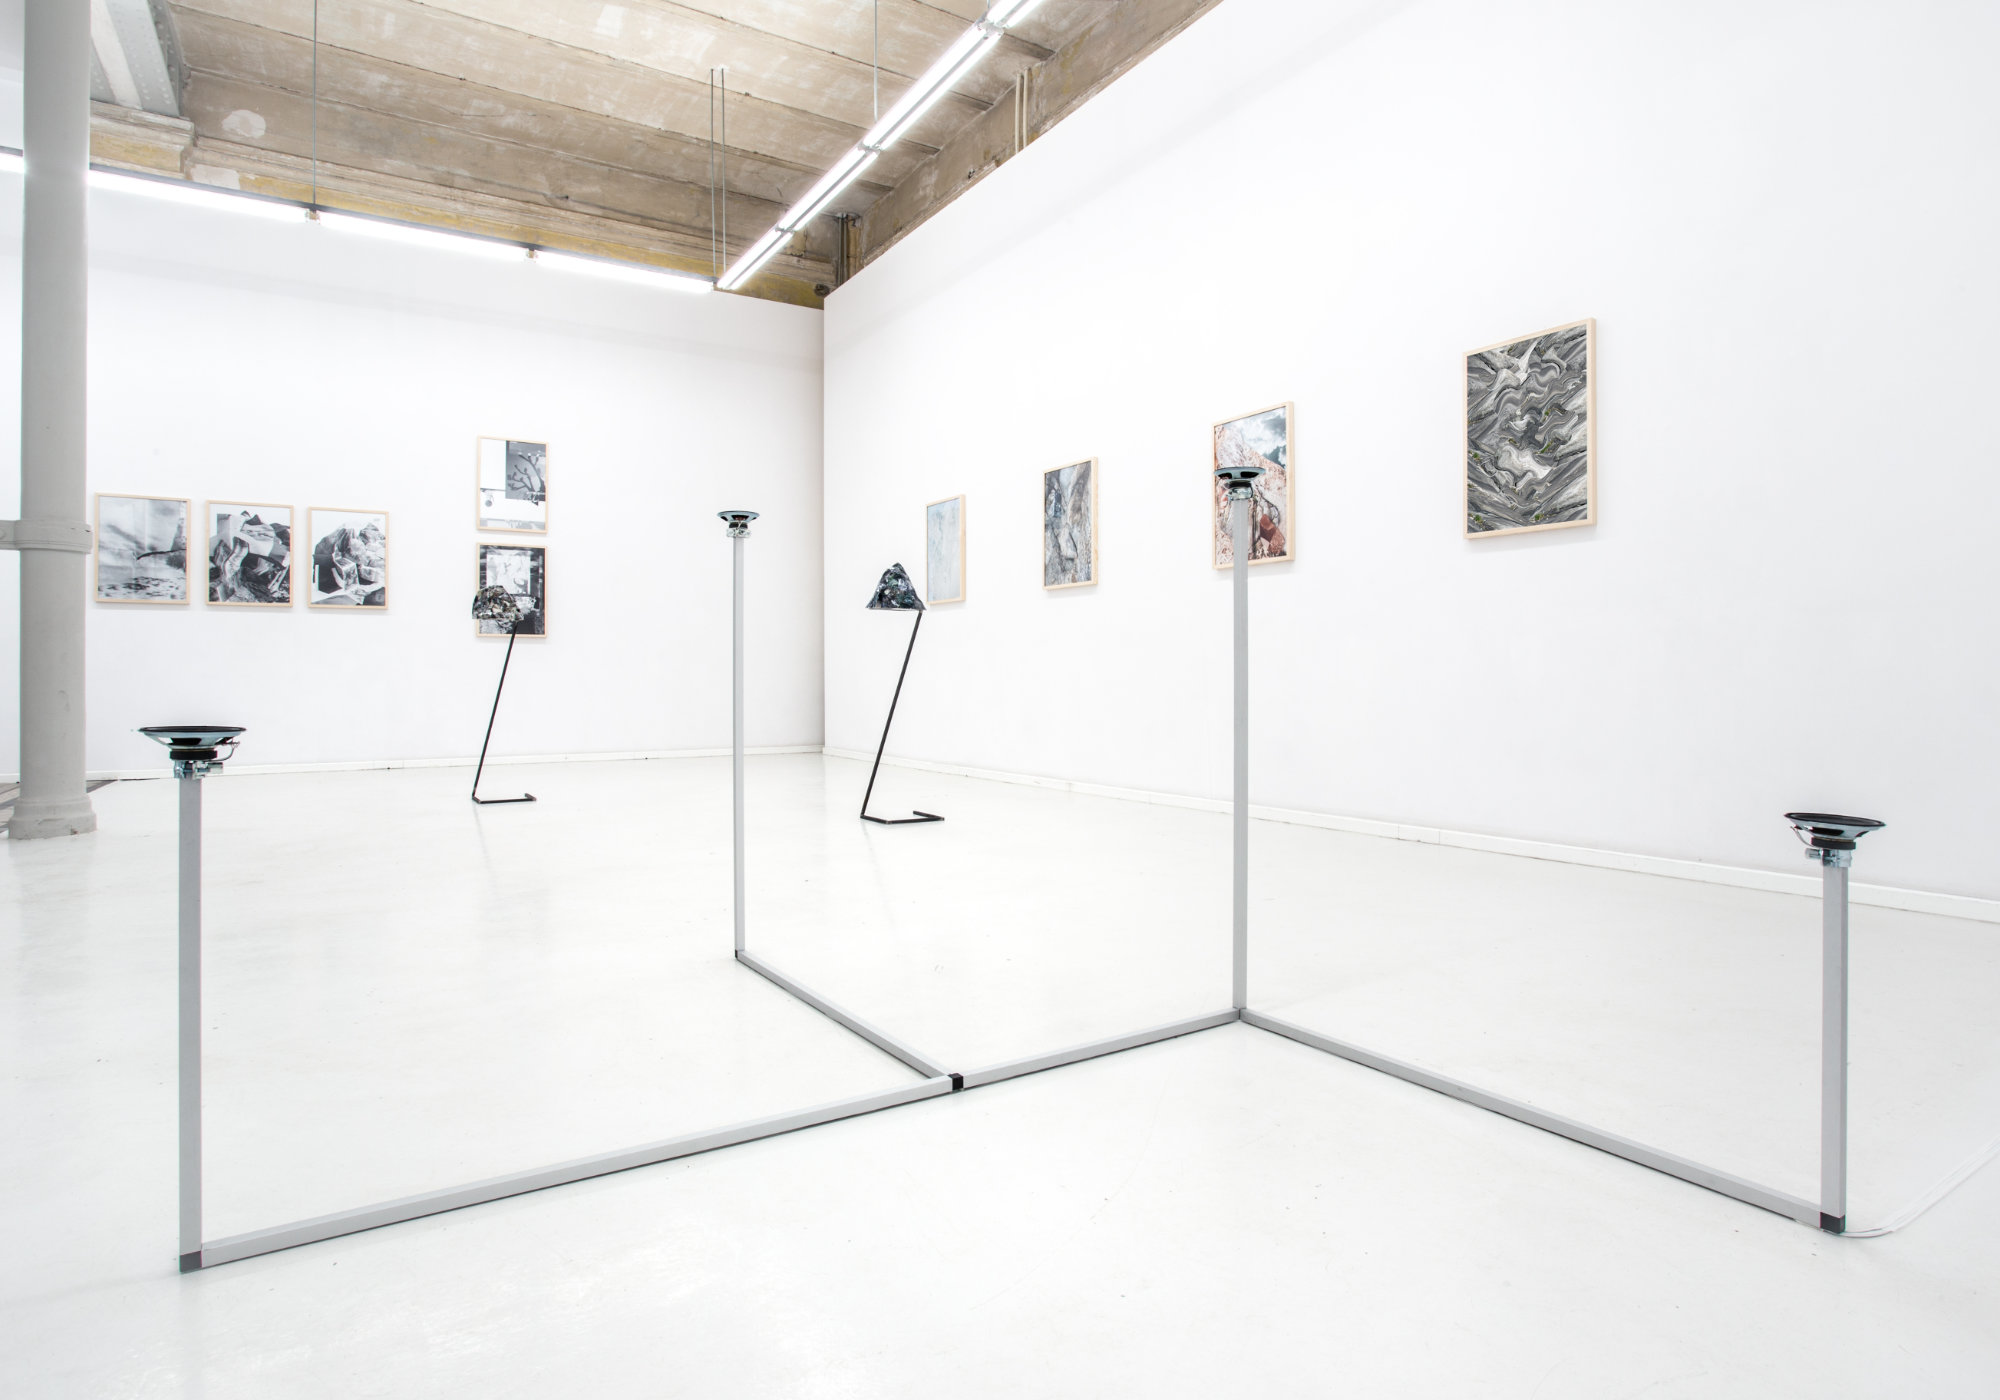 Jacek Doroszenko - Sound installation - Warsaw - Propaganda - Exhibition 01